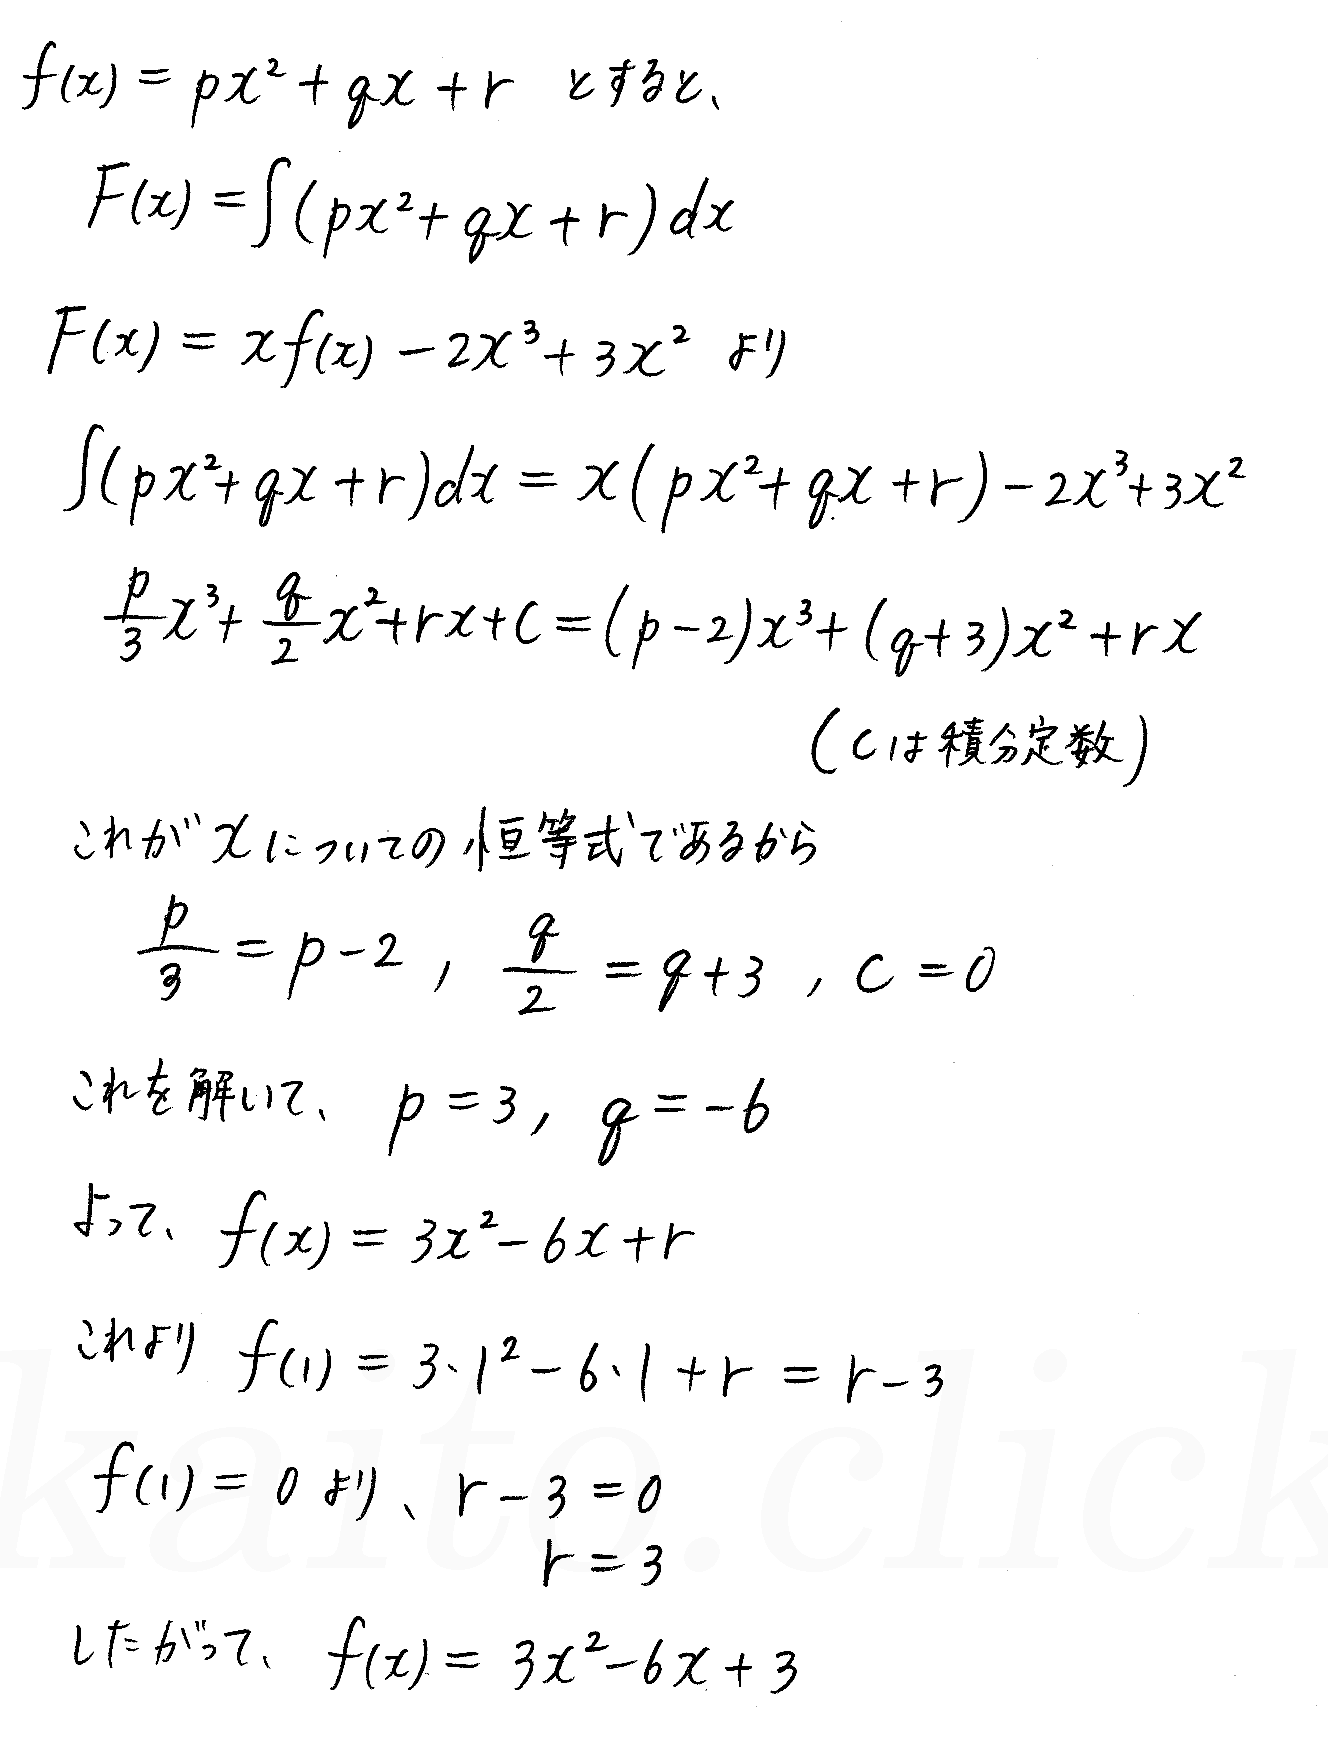 3TRIAL数学2-412解答